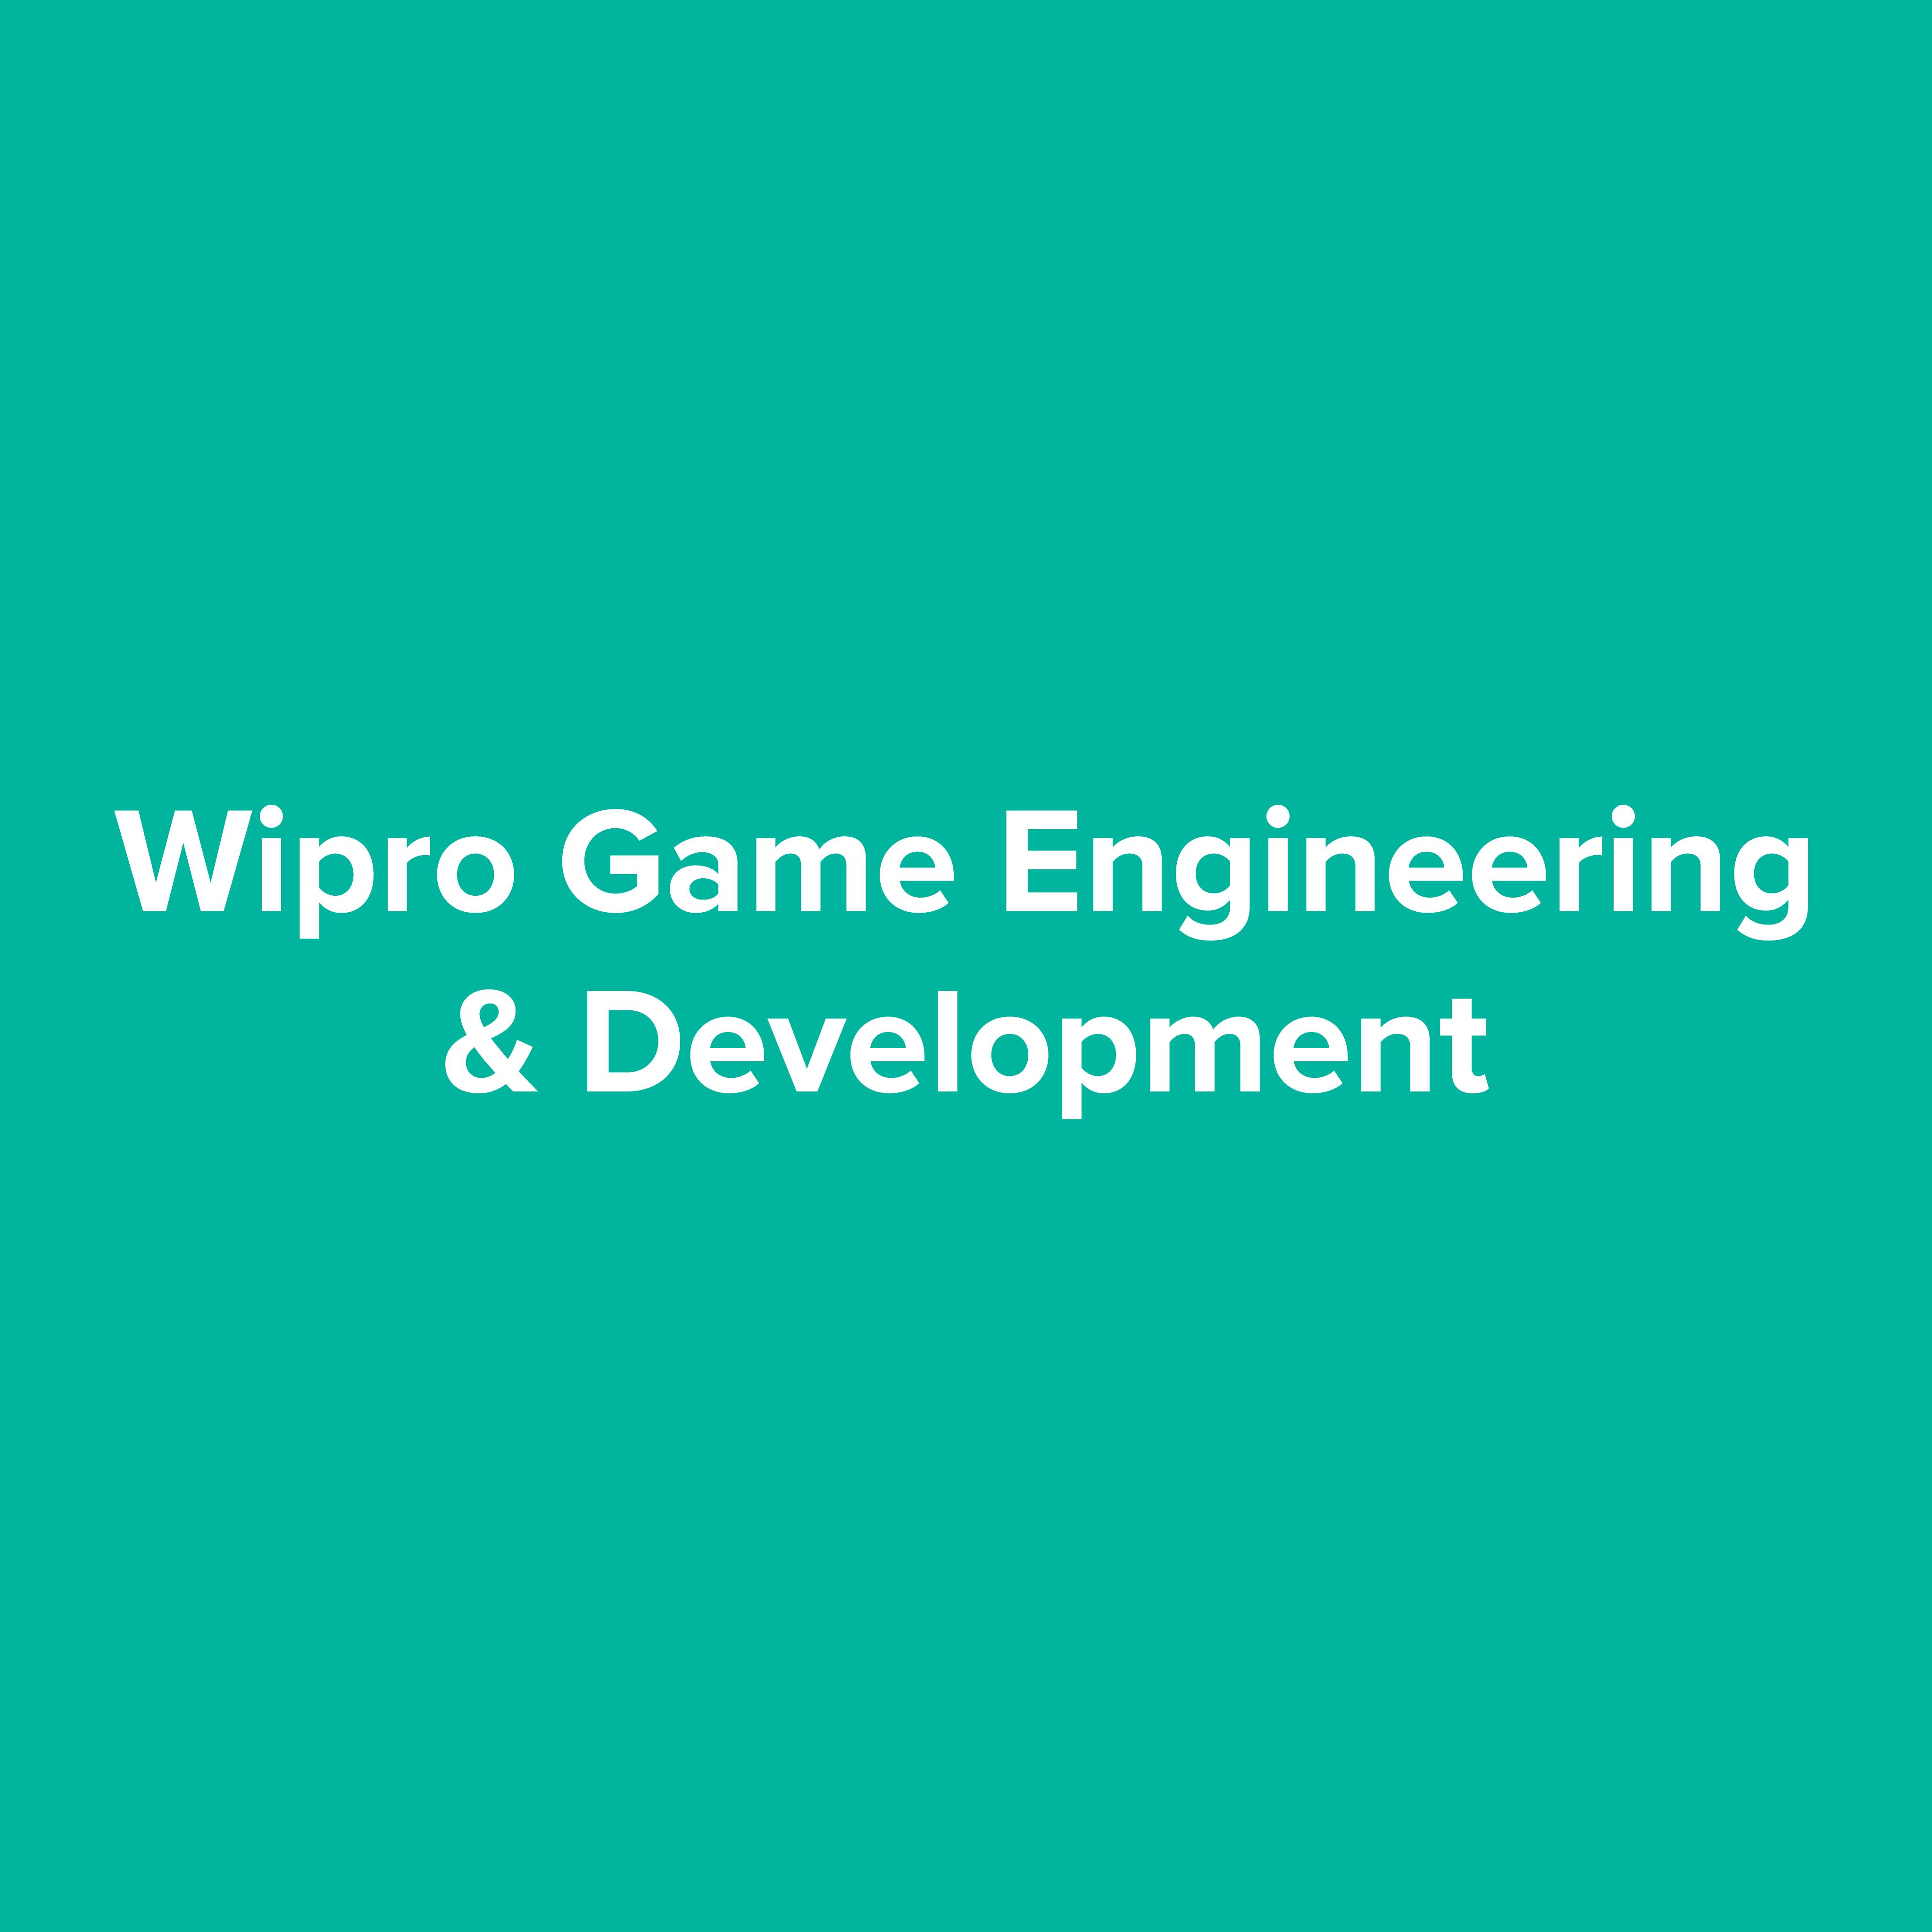 Wipro Game Engineering & Development